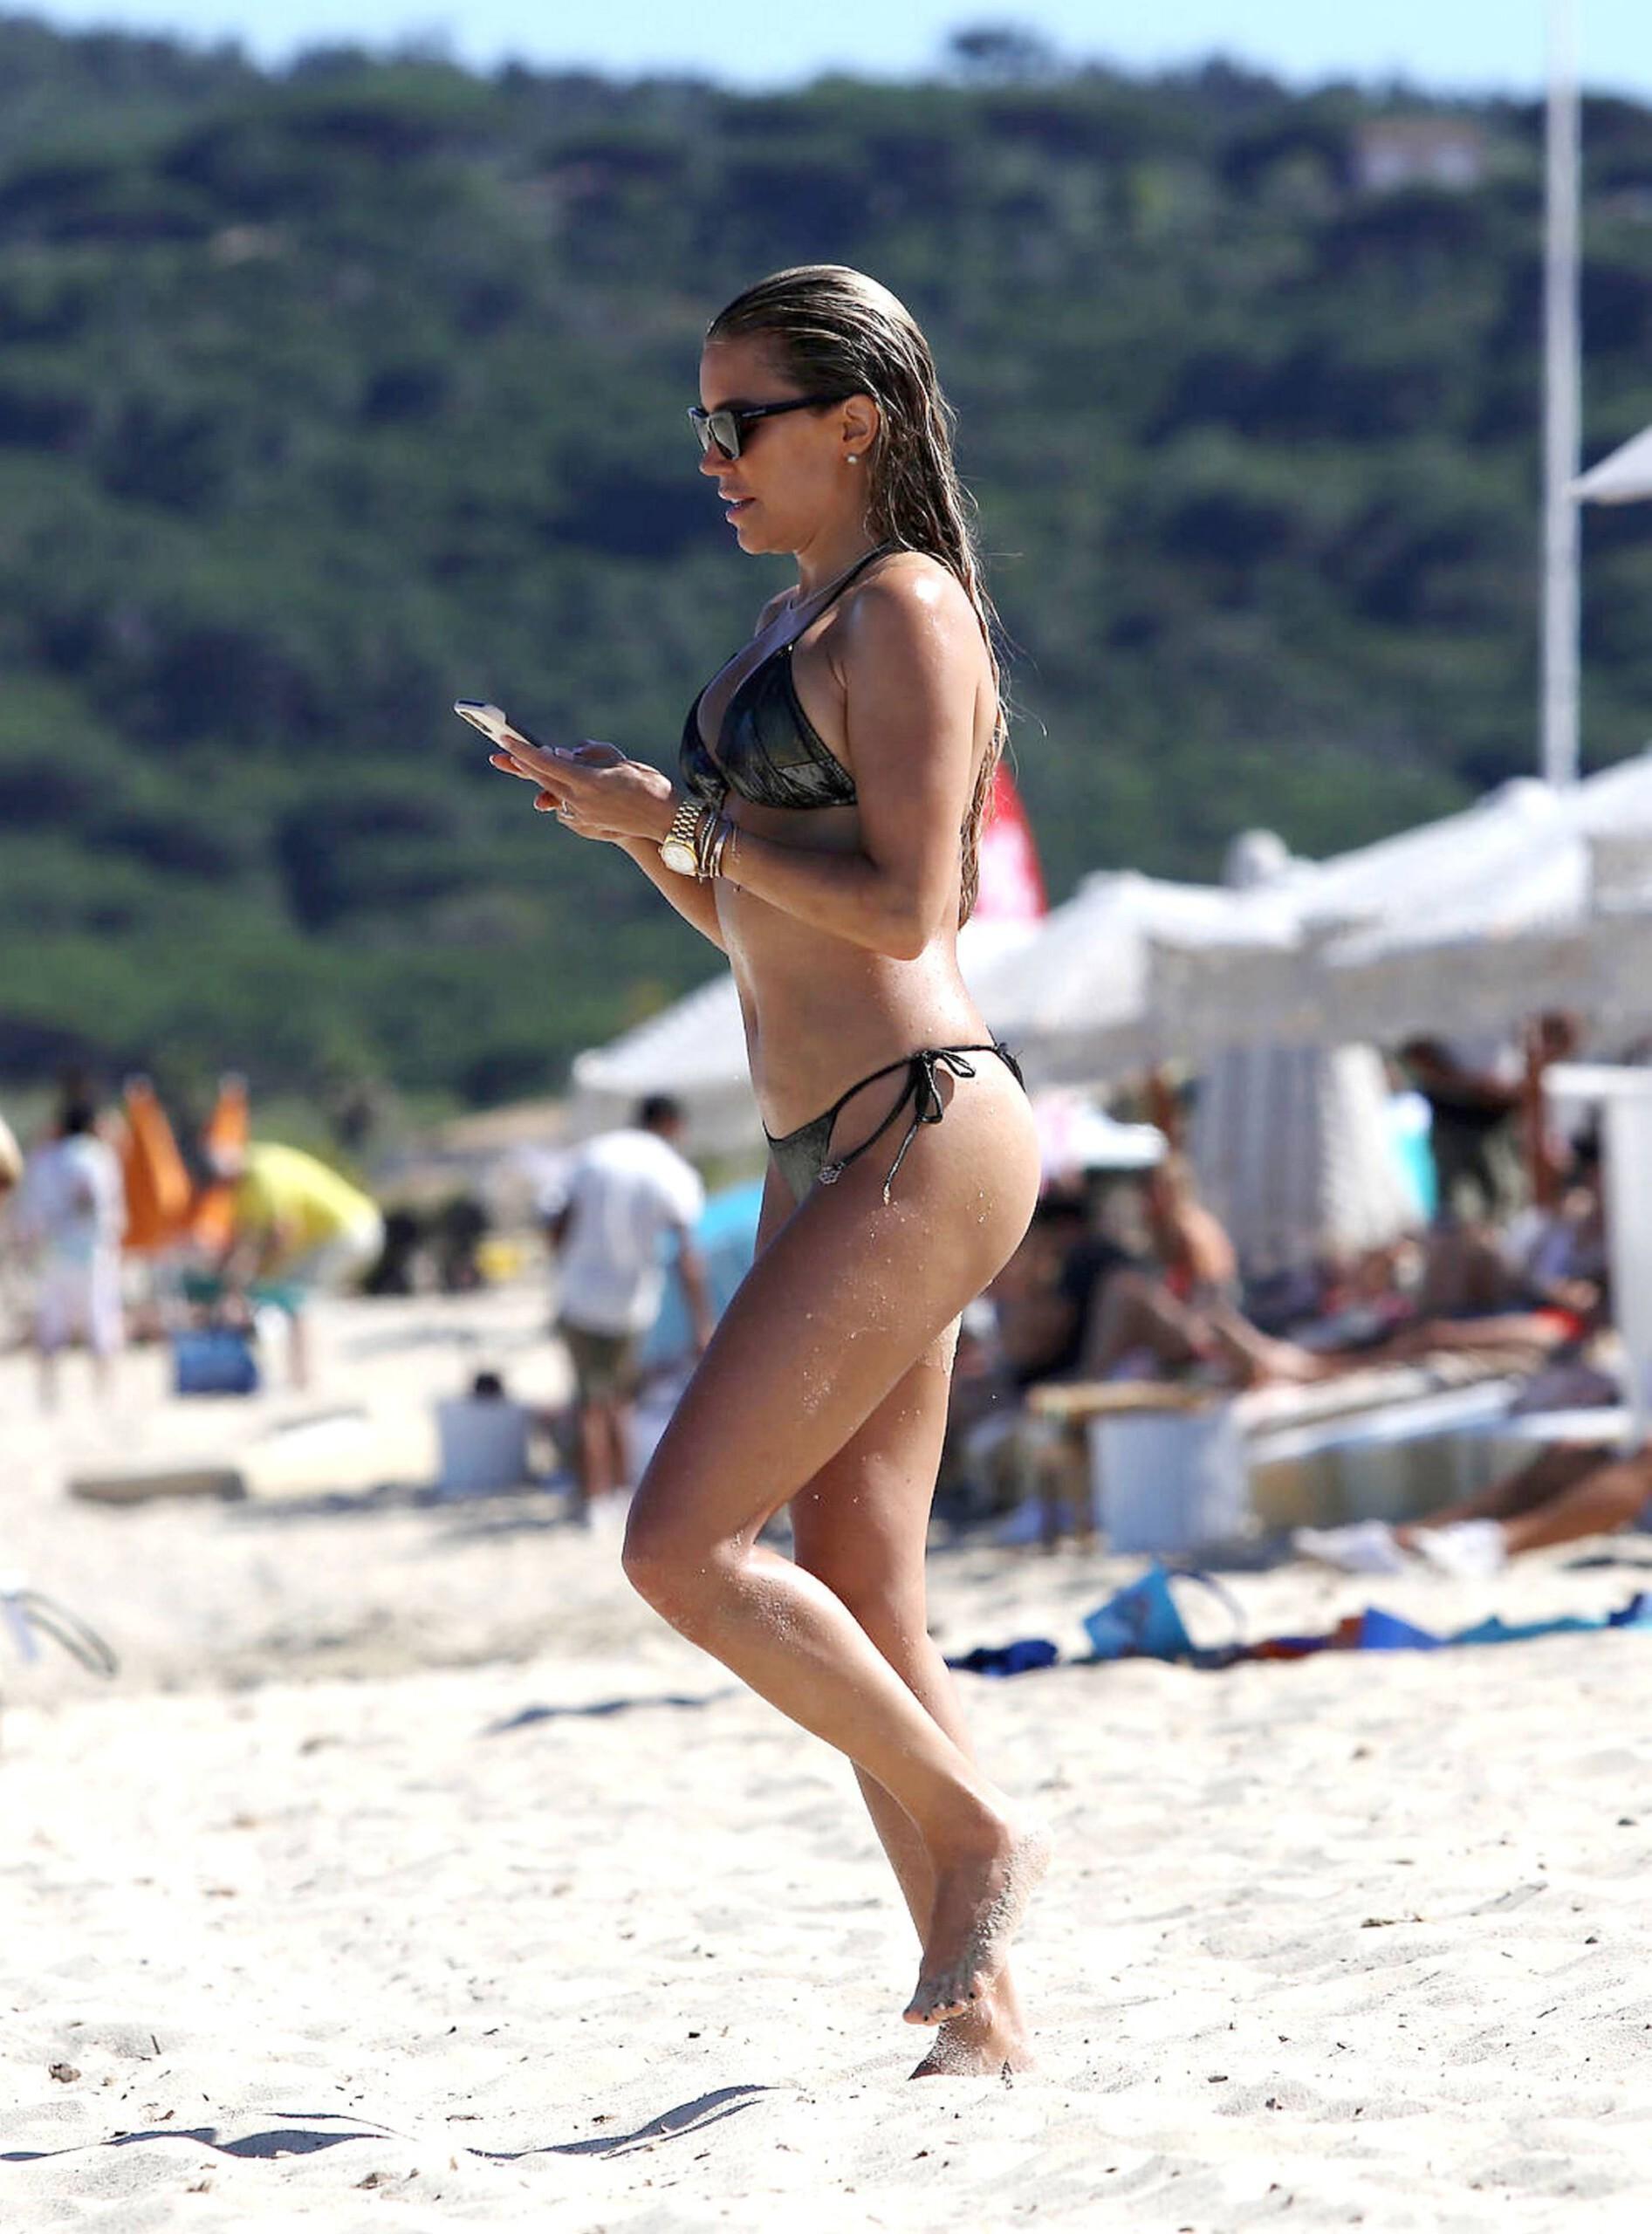 Sylvie Meis – Sexy Boobs In Bikini On The Beach In Saint Tropez 0014